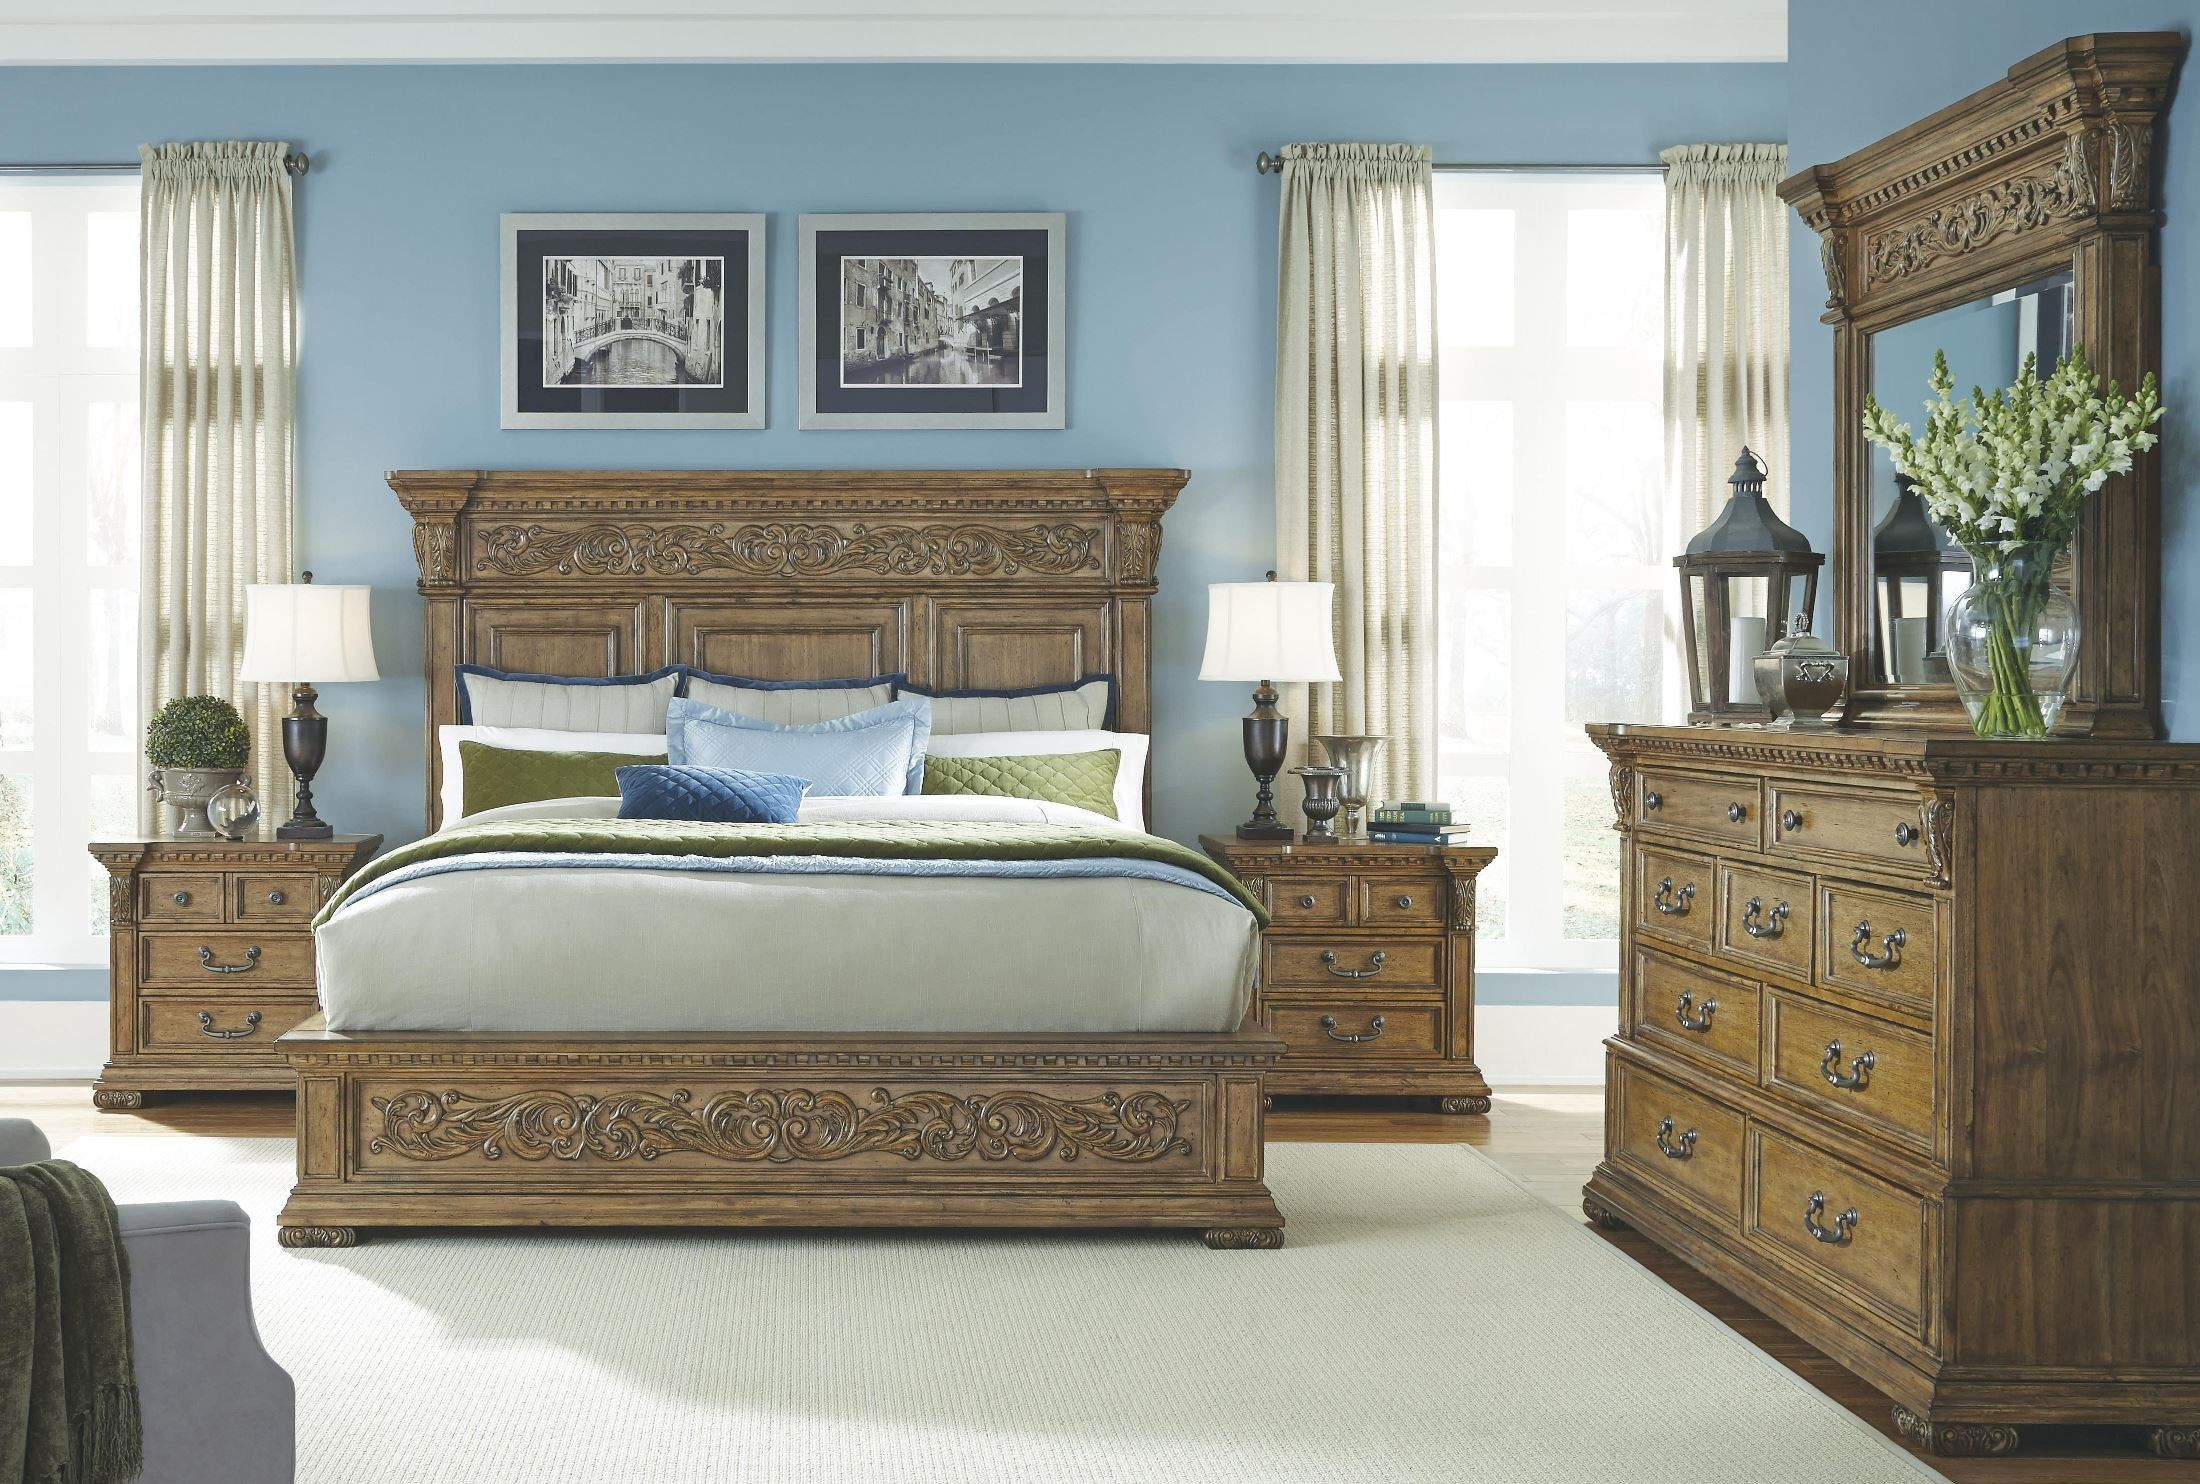 stratton medium wood stratton platform bedroom set from pulaski 737170 71 72 coleman furniture